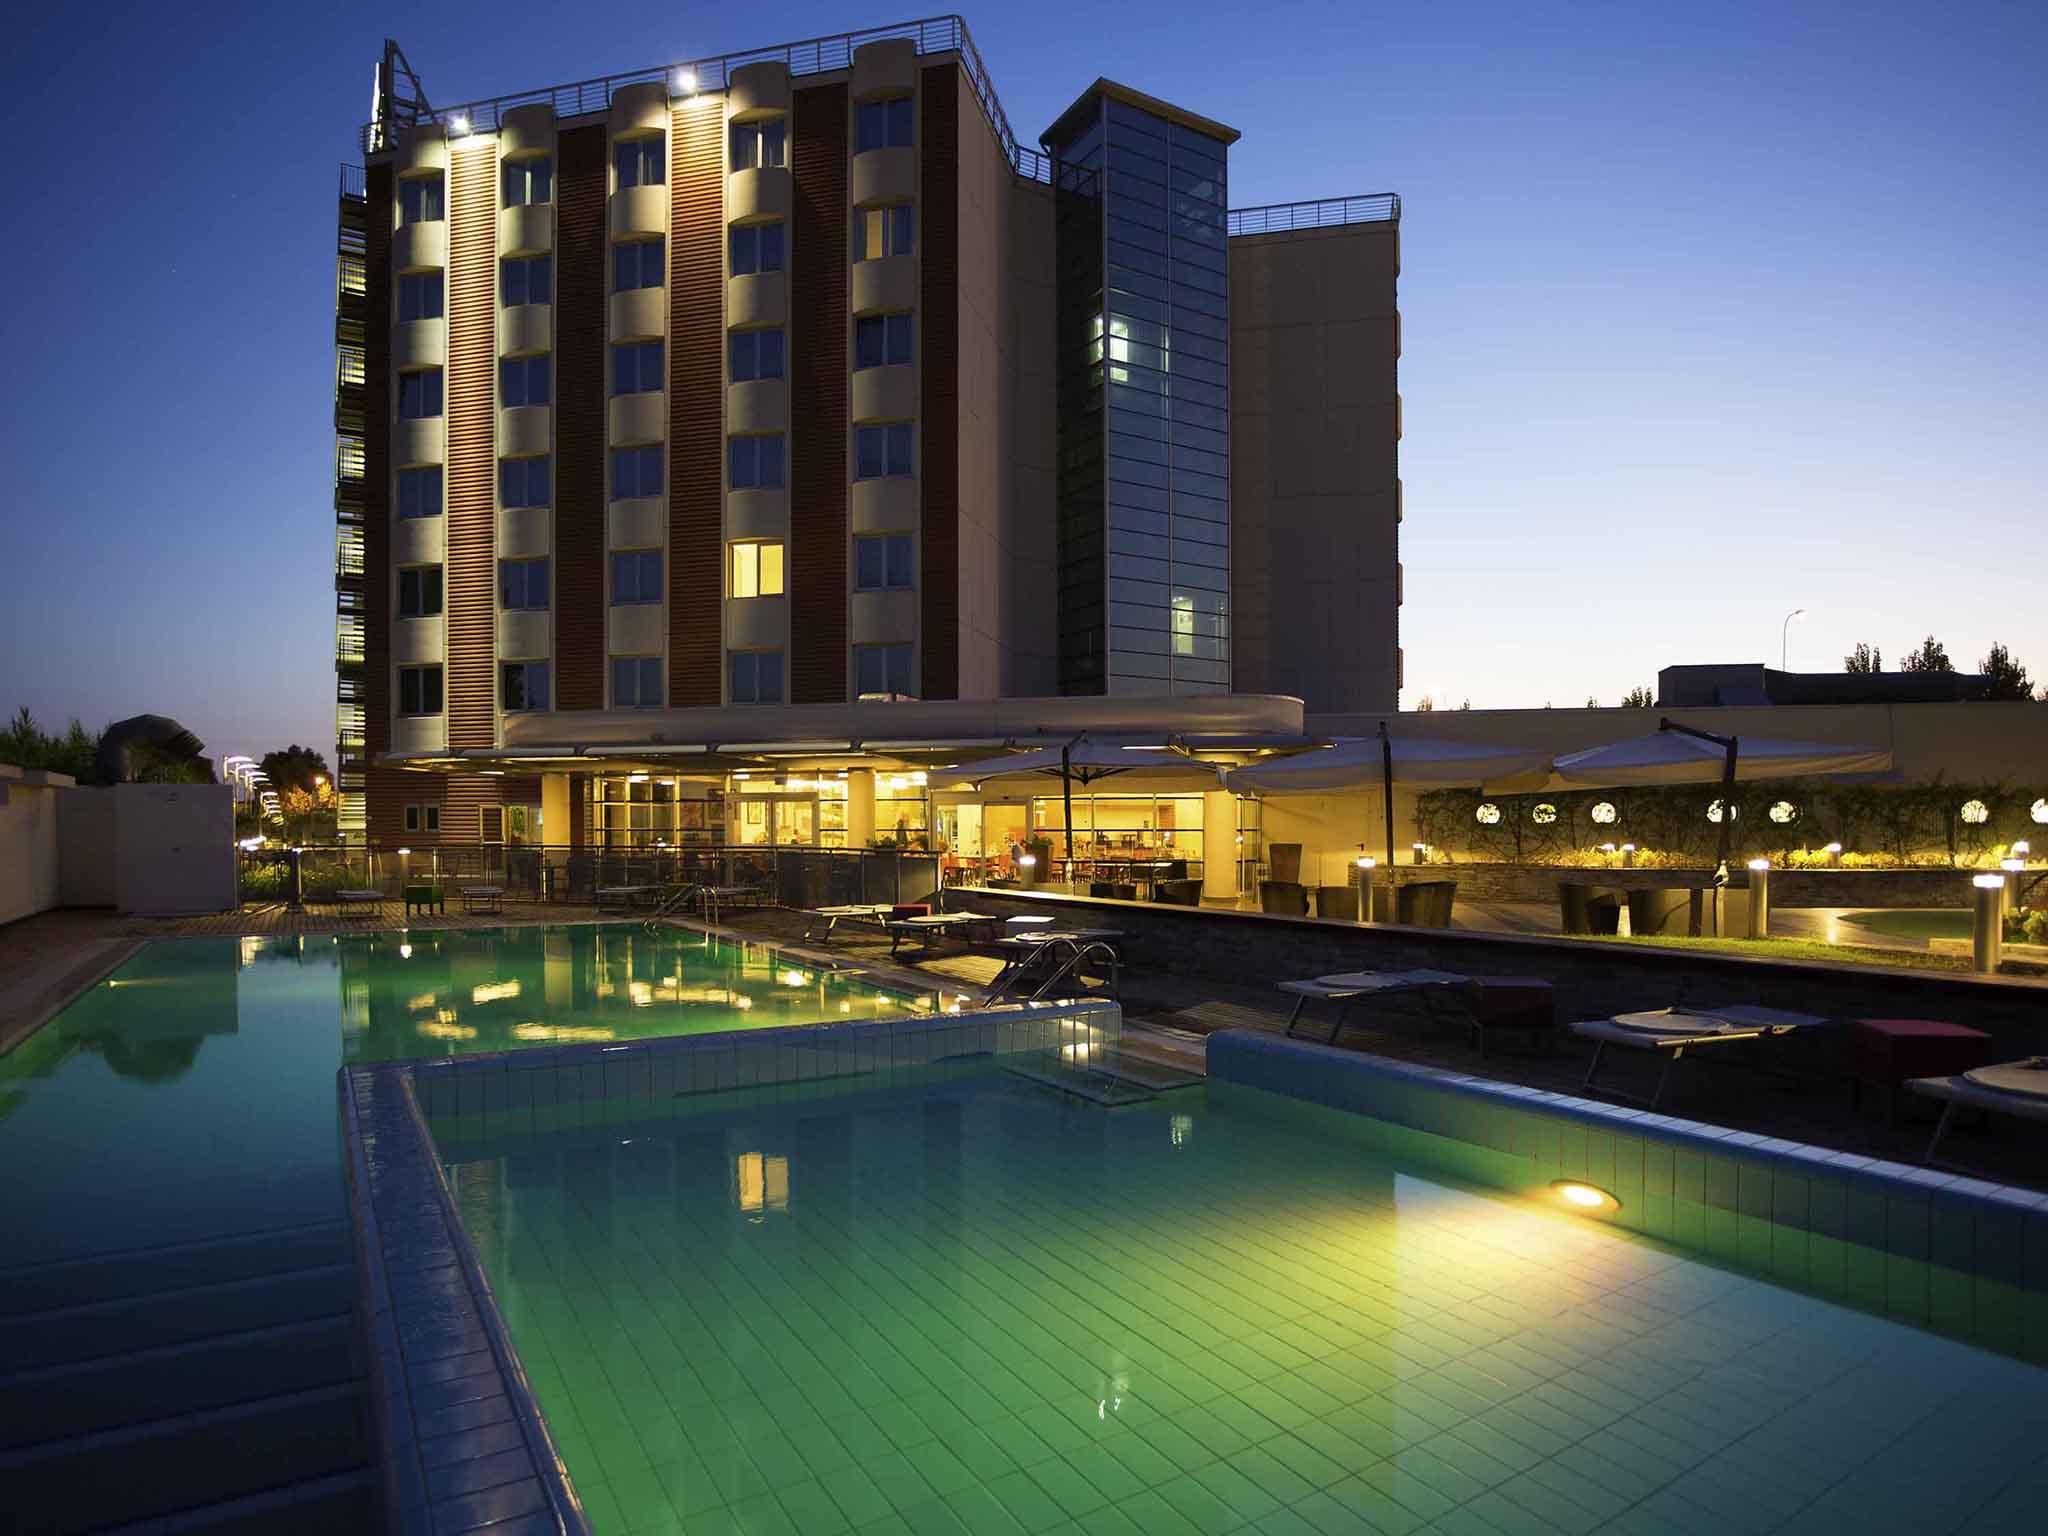 Hotel Novotel Rno Est Arechi